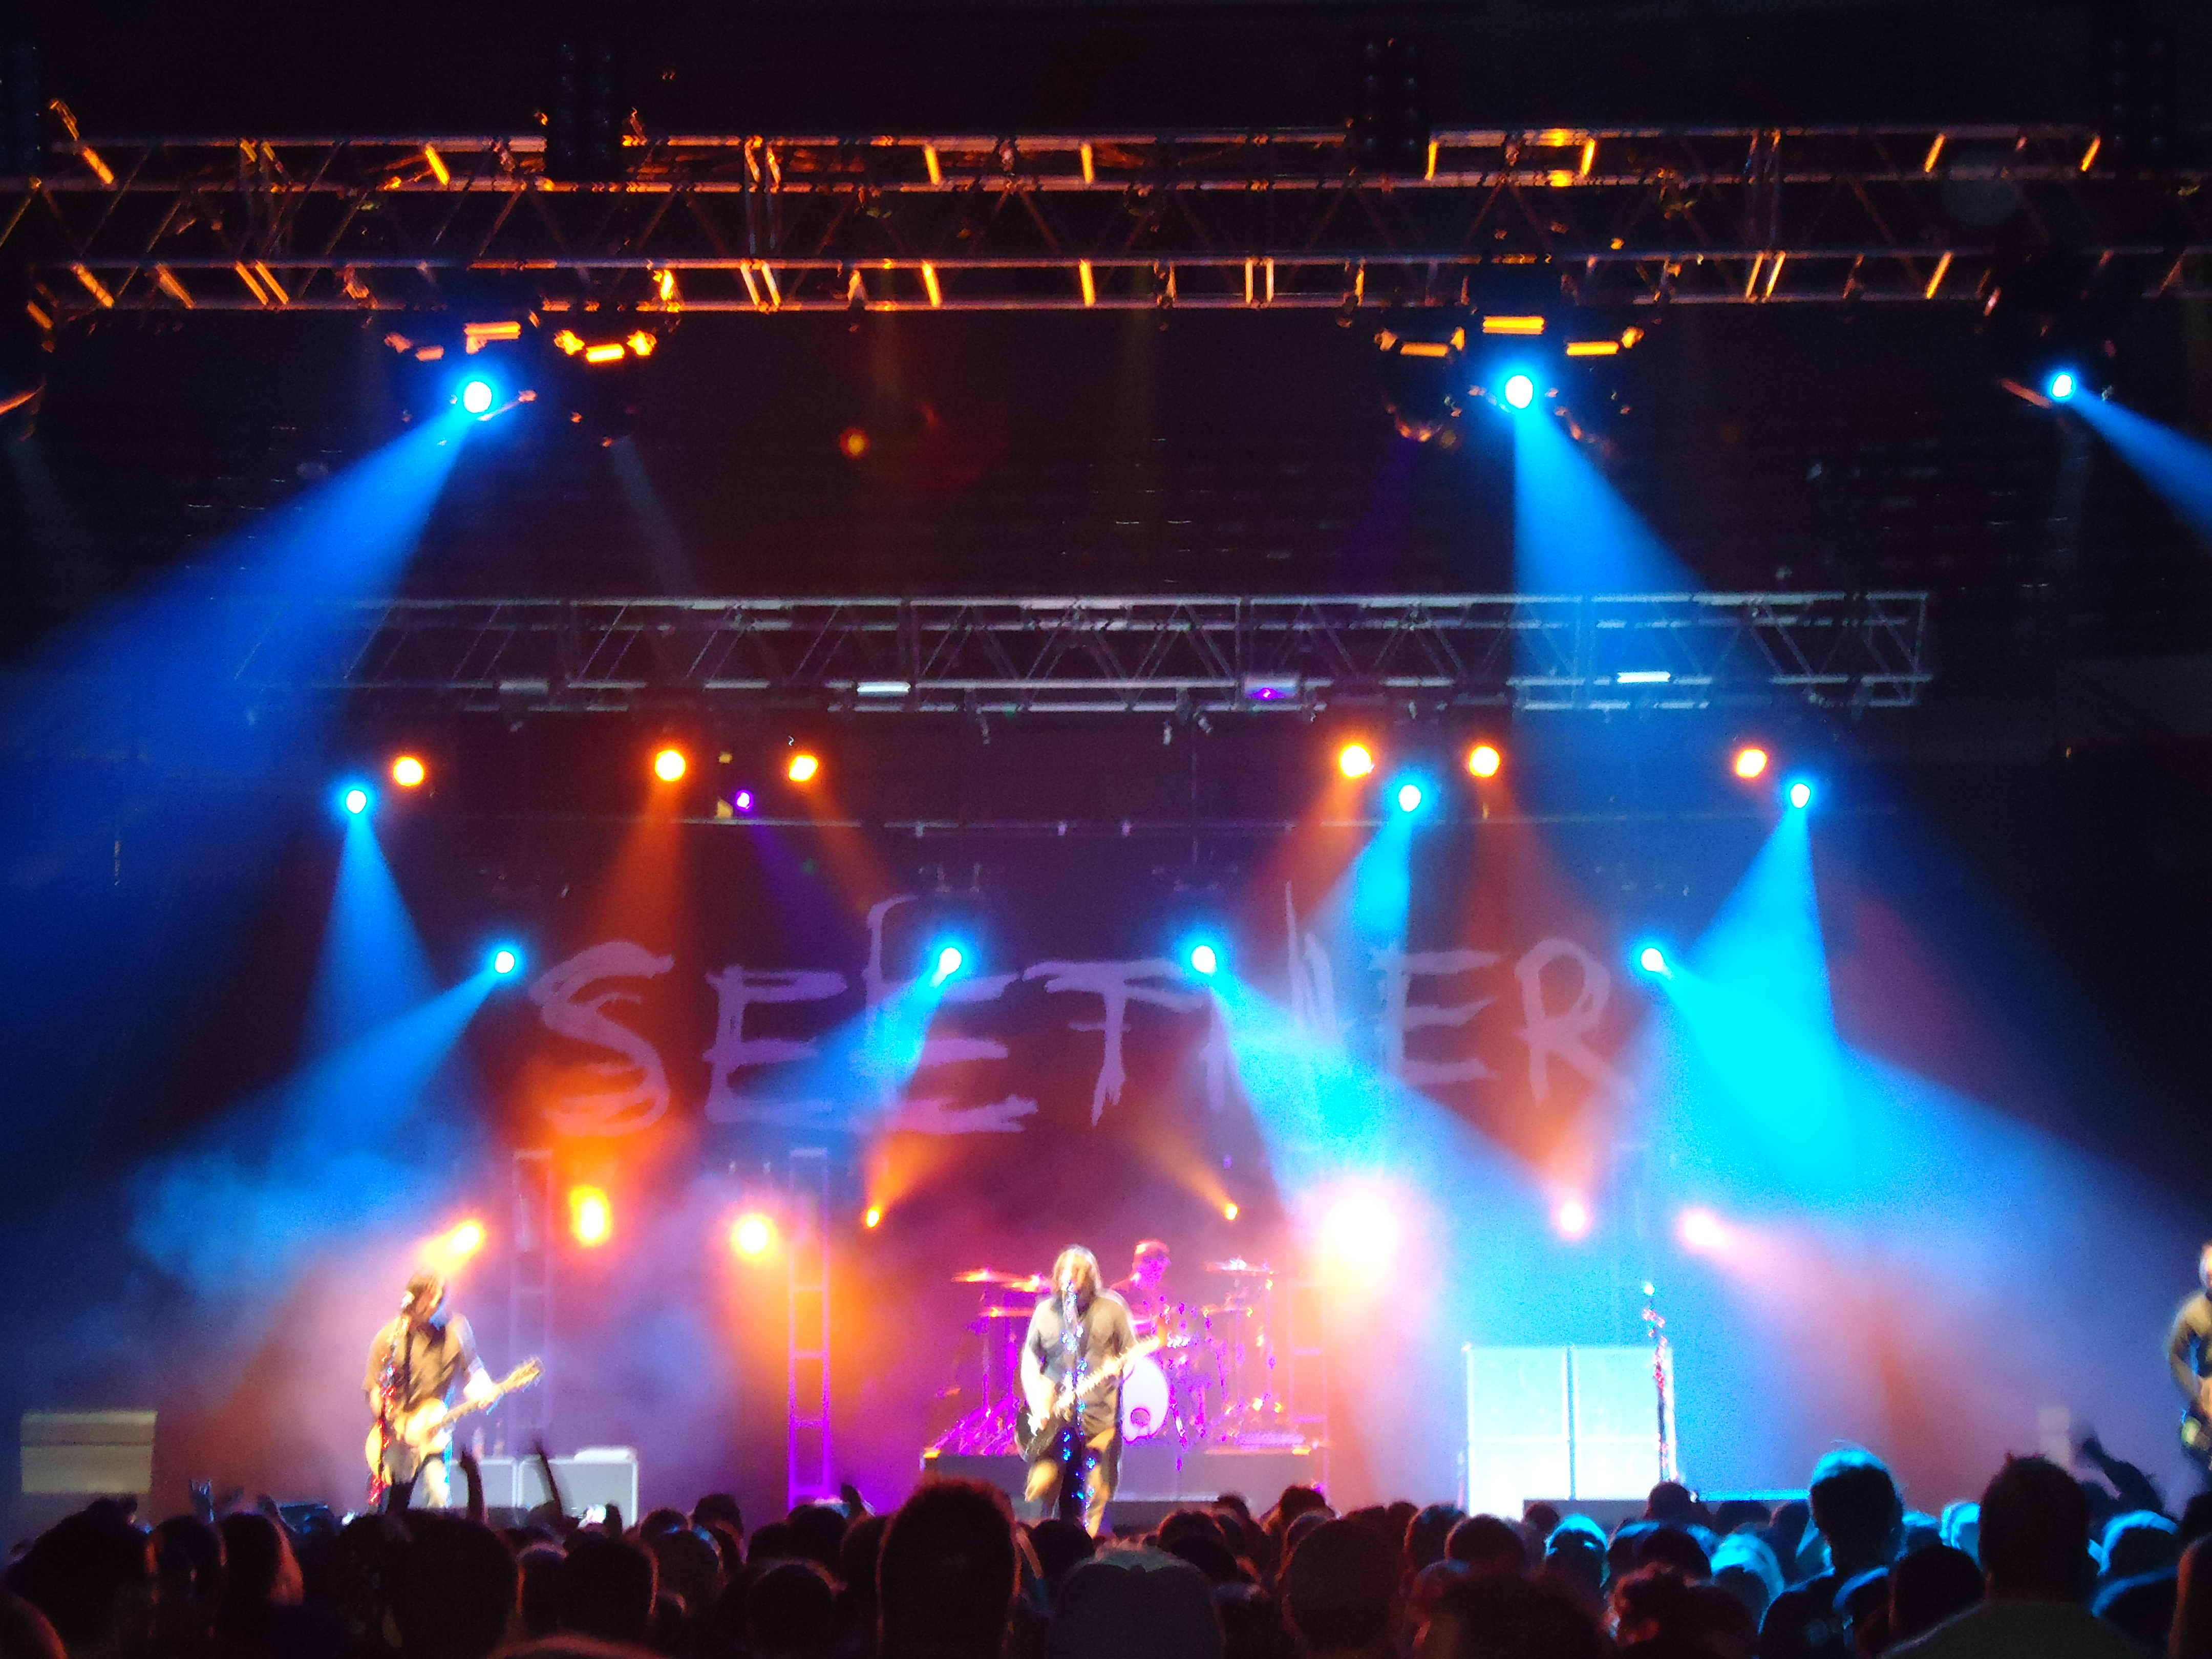 Pics photos rock concert background - Now